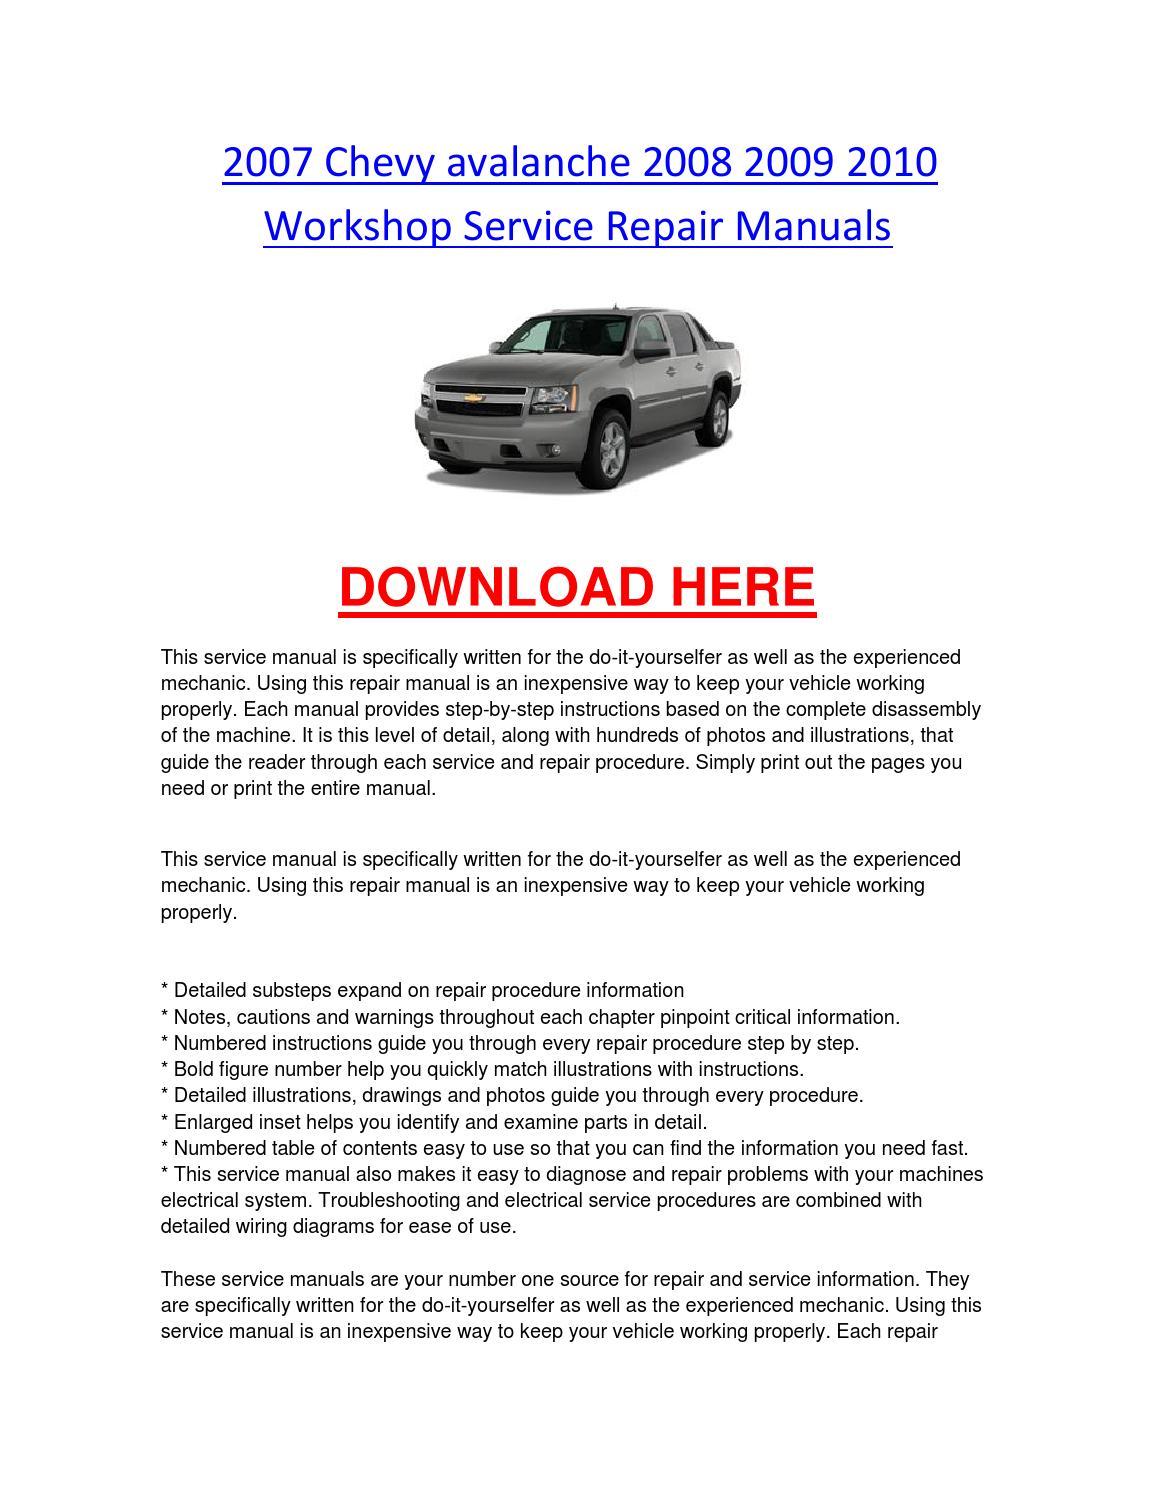 2007 Chevy Avalanche 2008 2009 2010 Workshop Service